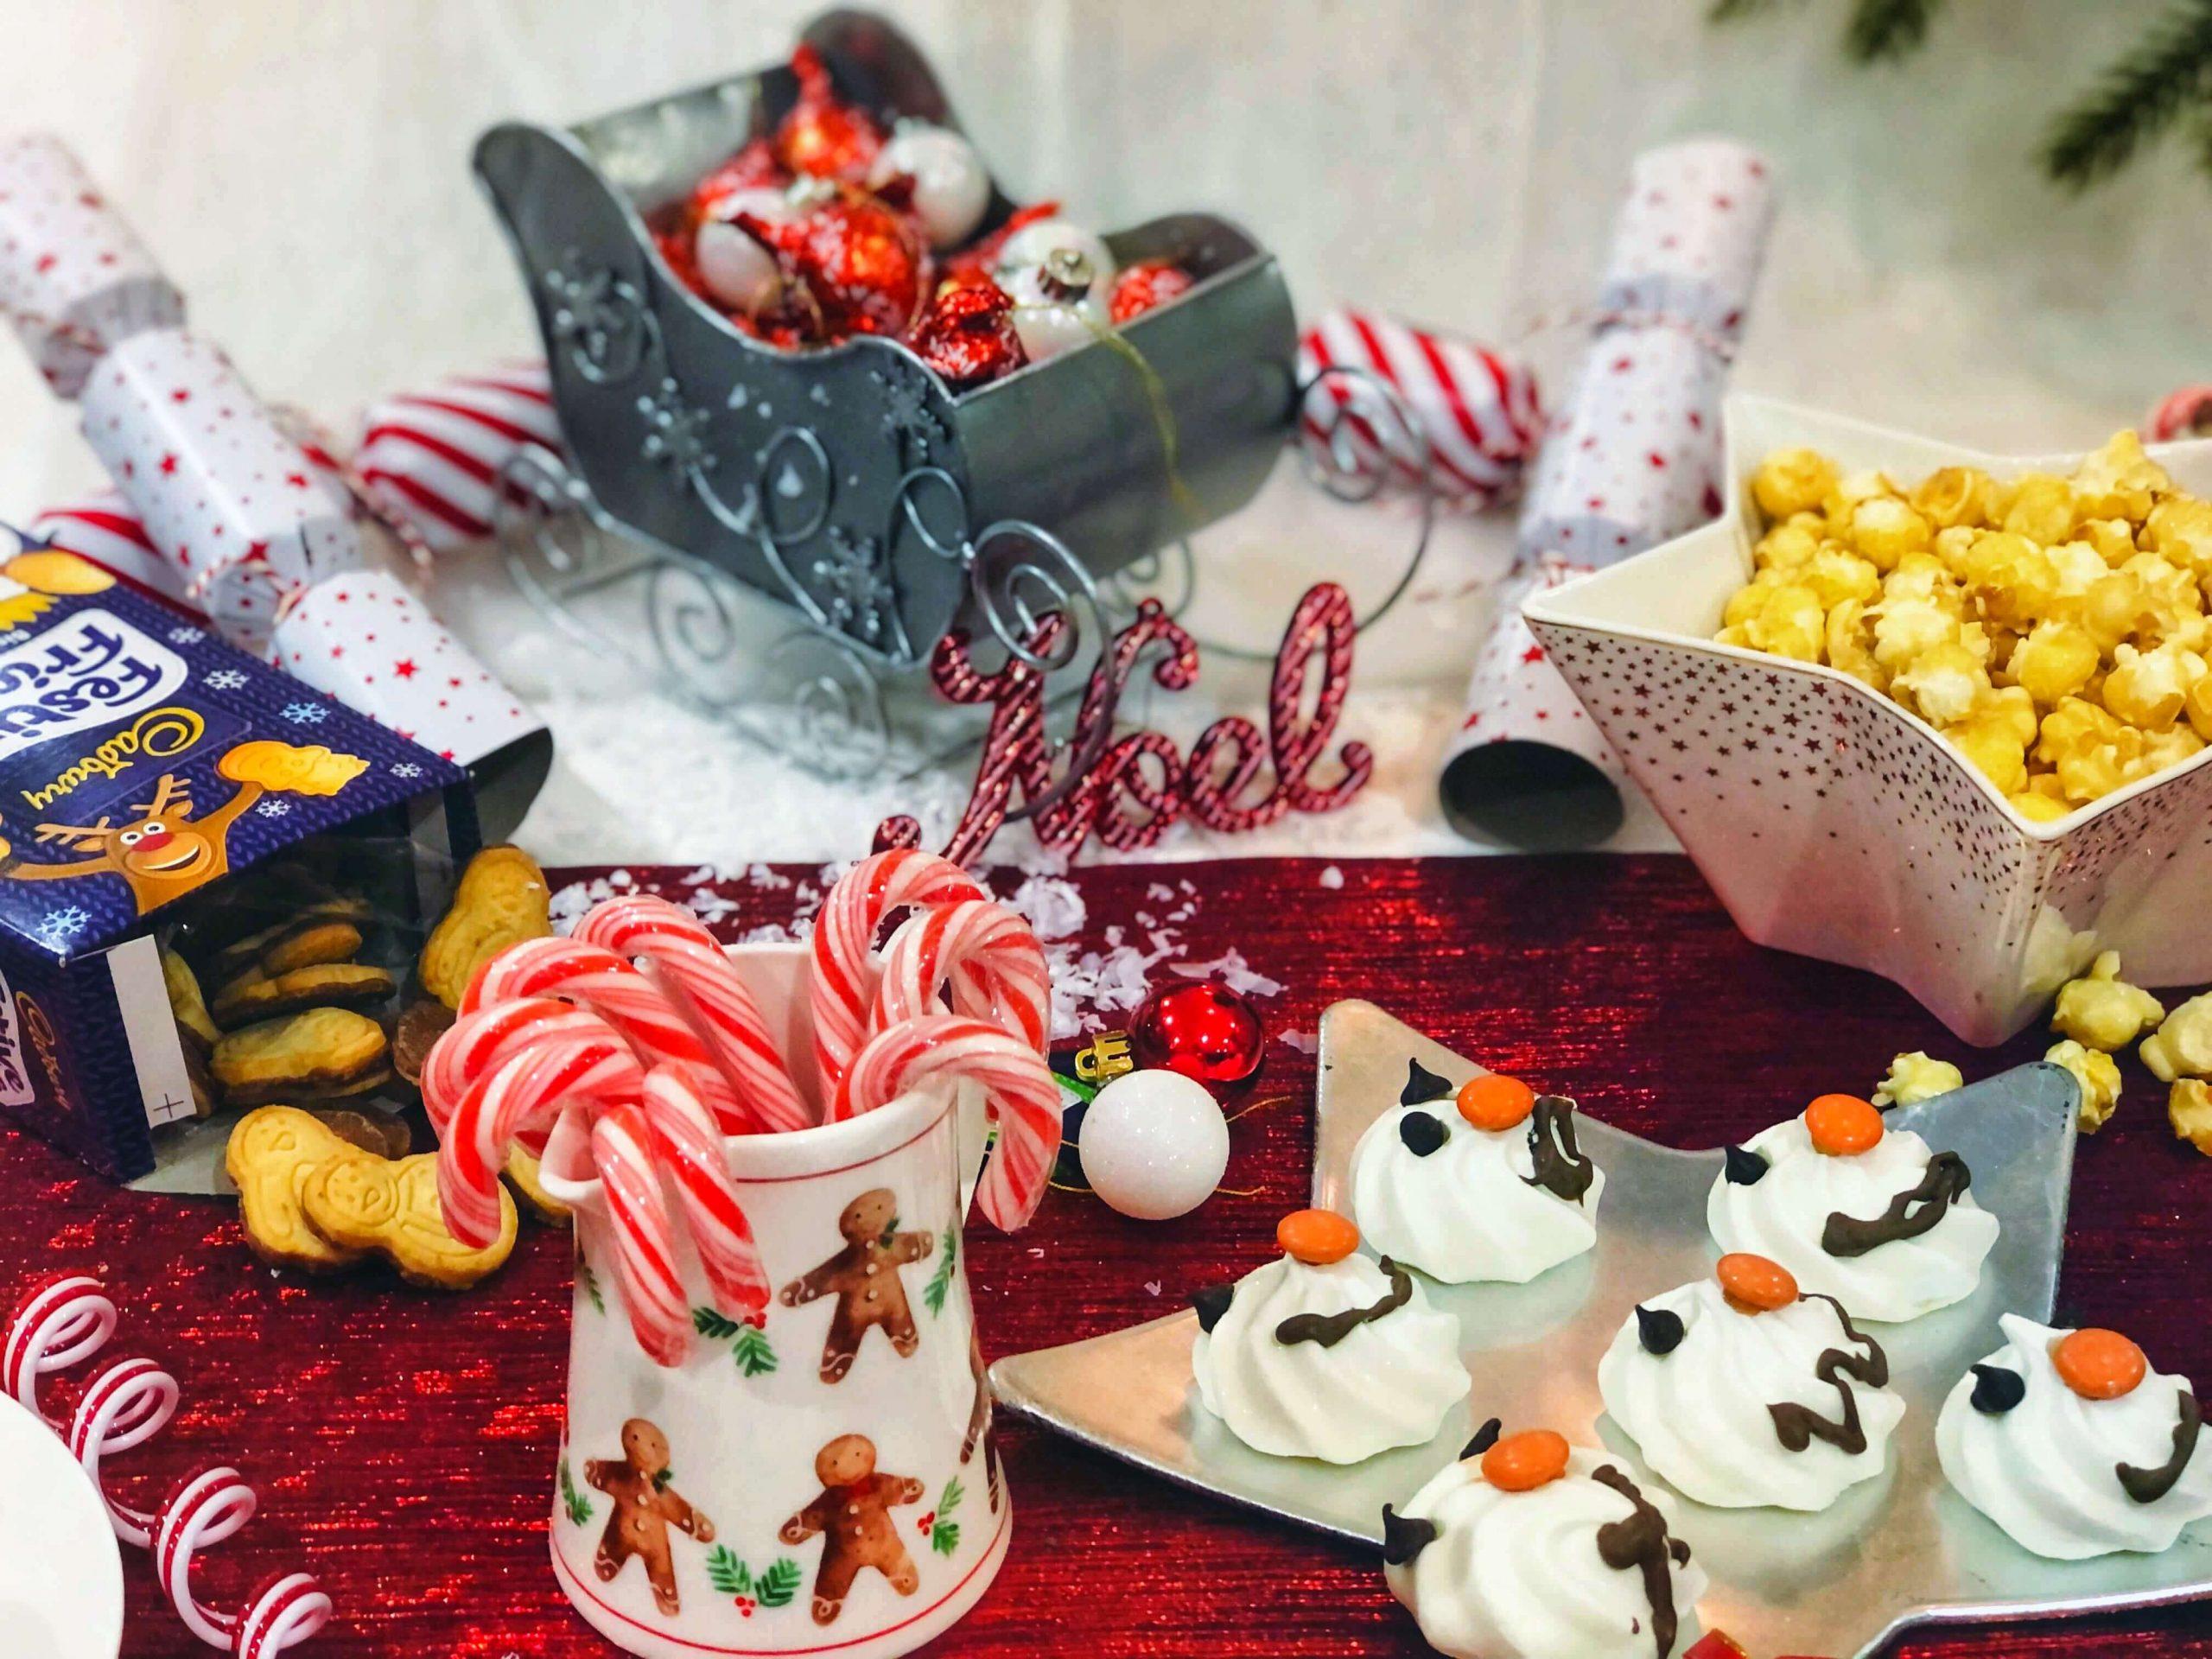 North Pole Breakfast Ideas - candy canes, snowman meringue faces, Cadbury Festive Faces, etc